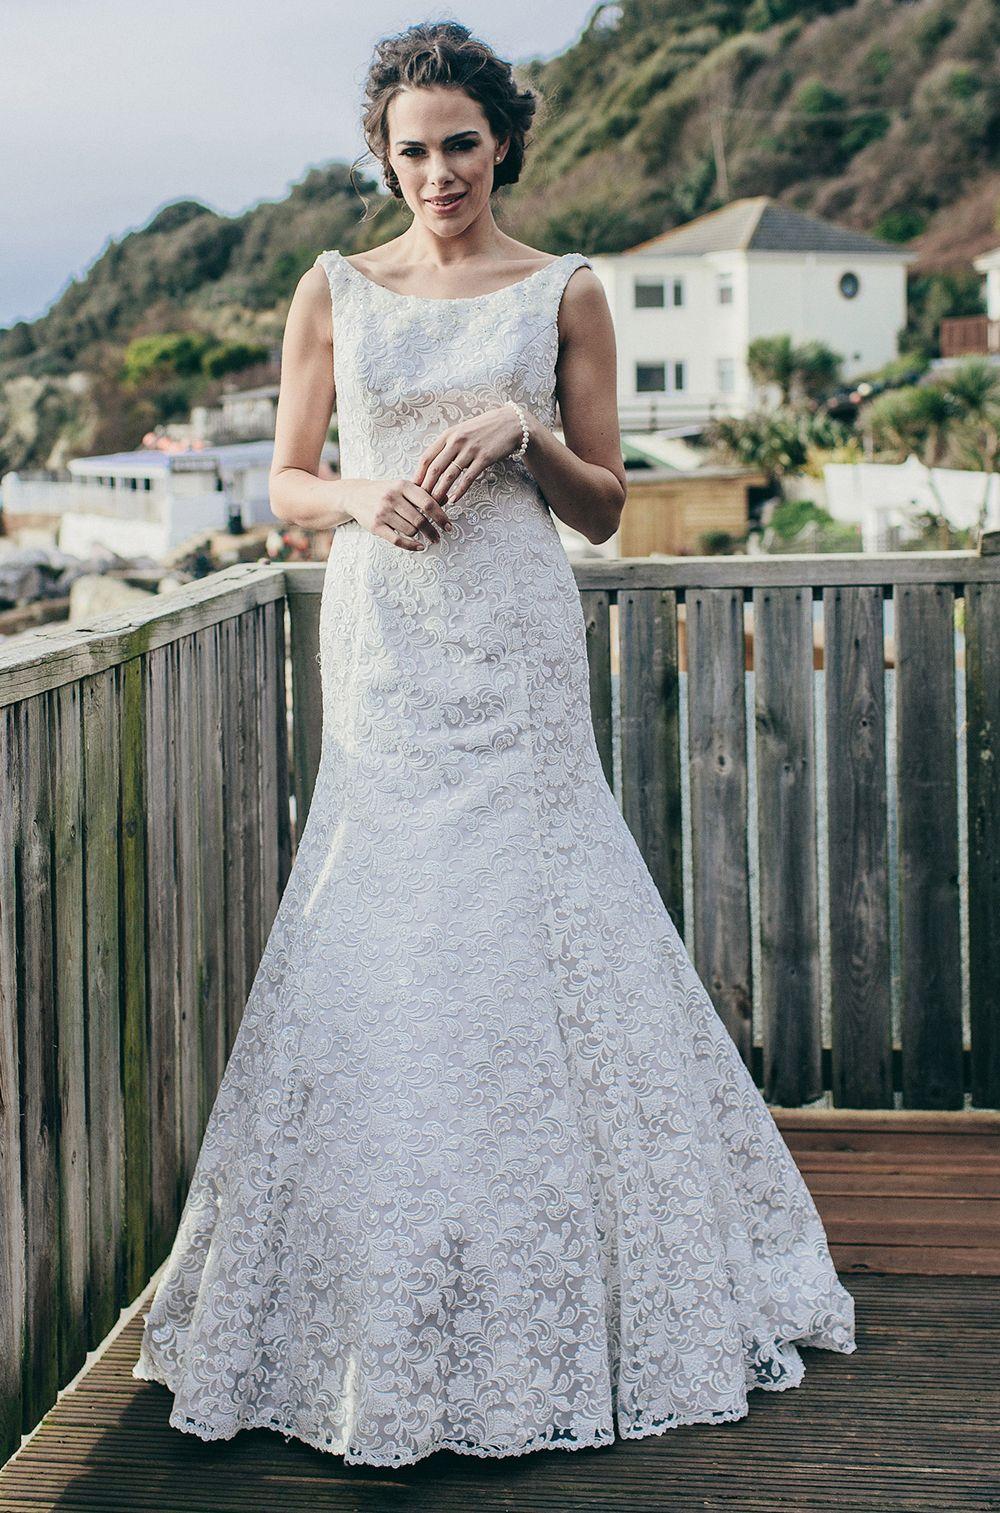 Dorable Bridal Gown Websites Ornament - All Wedding Dresses ...